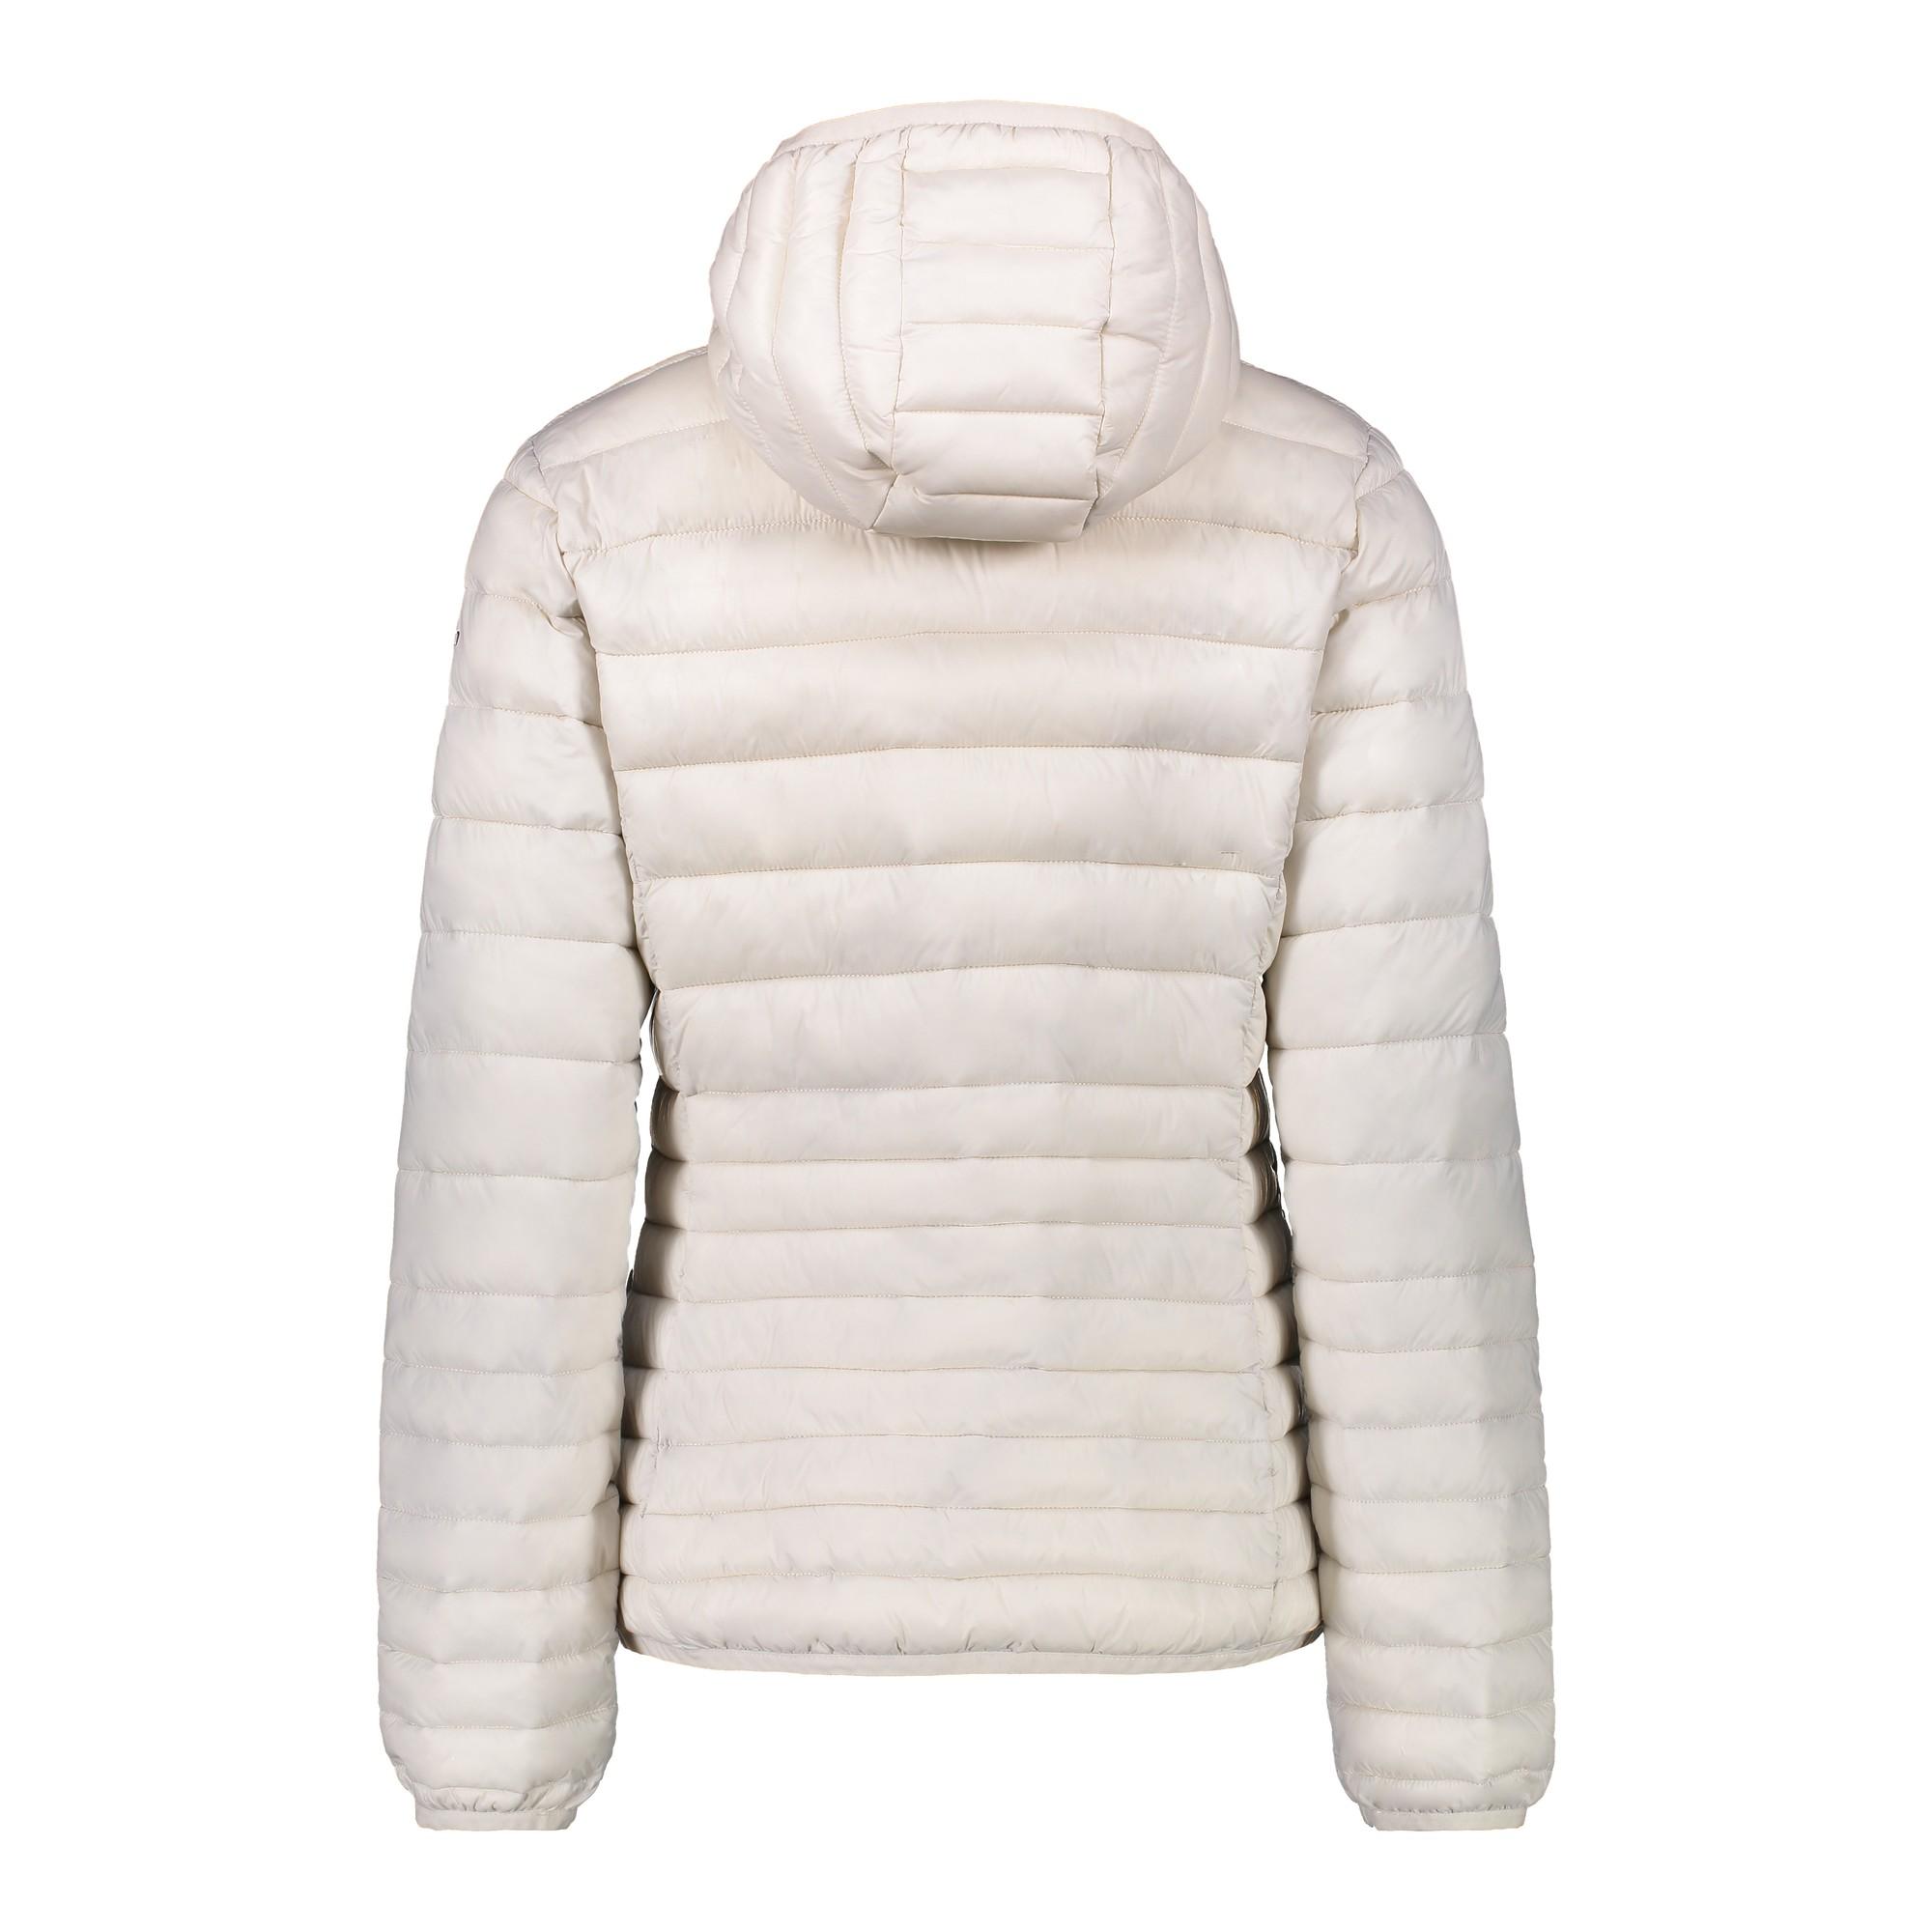 Daunenjacke Jacket Zip zu CMP Details Hood38Z1736BDamen Woman l1KJ3uTFc